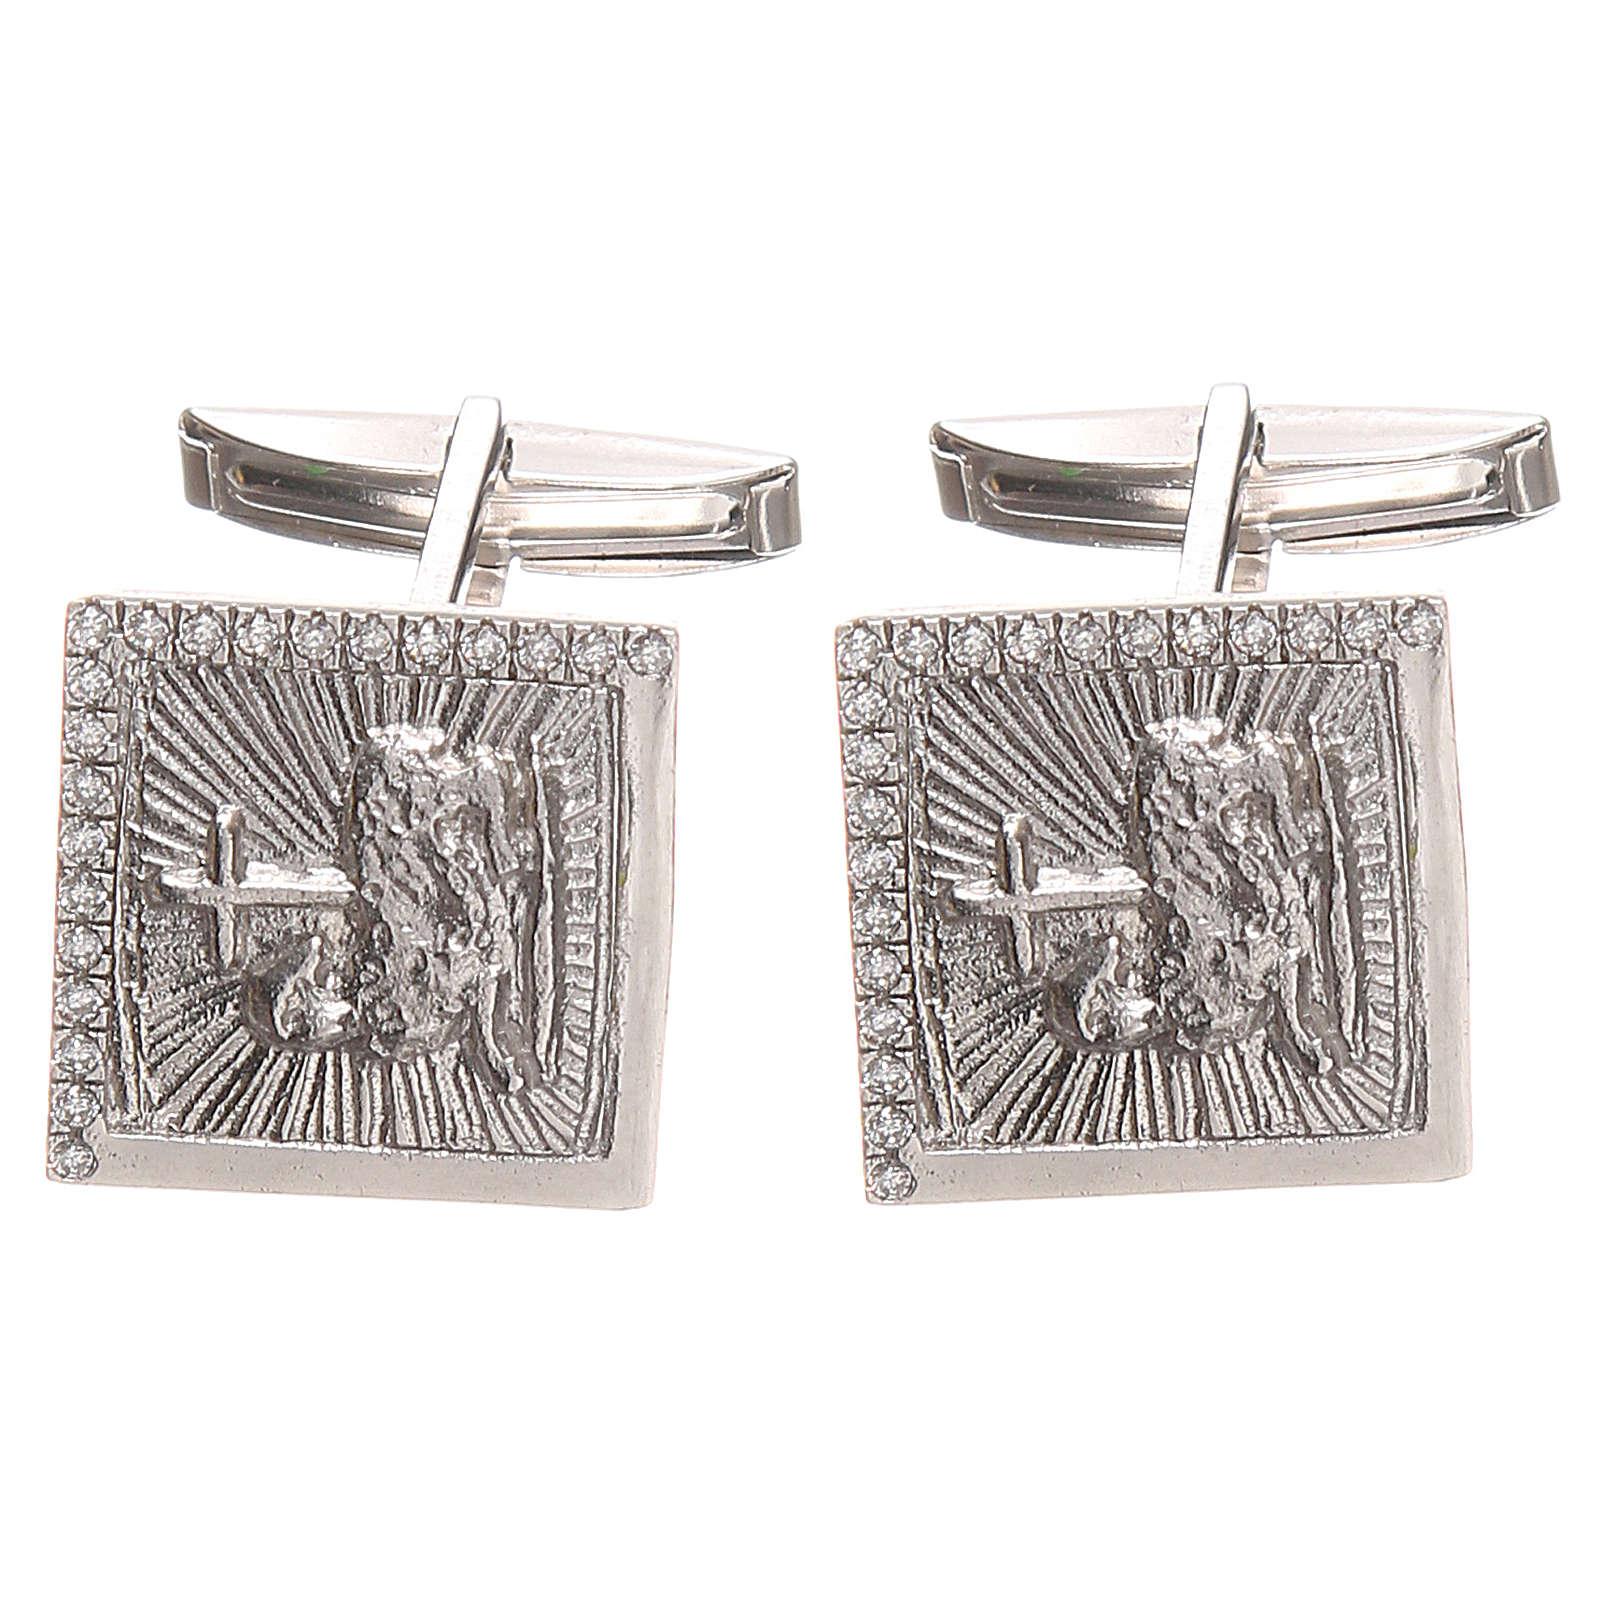 Lamb of God silver cufflinks 4